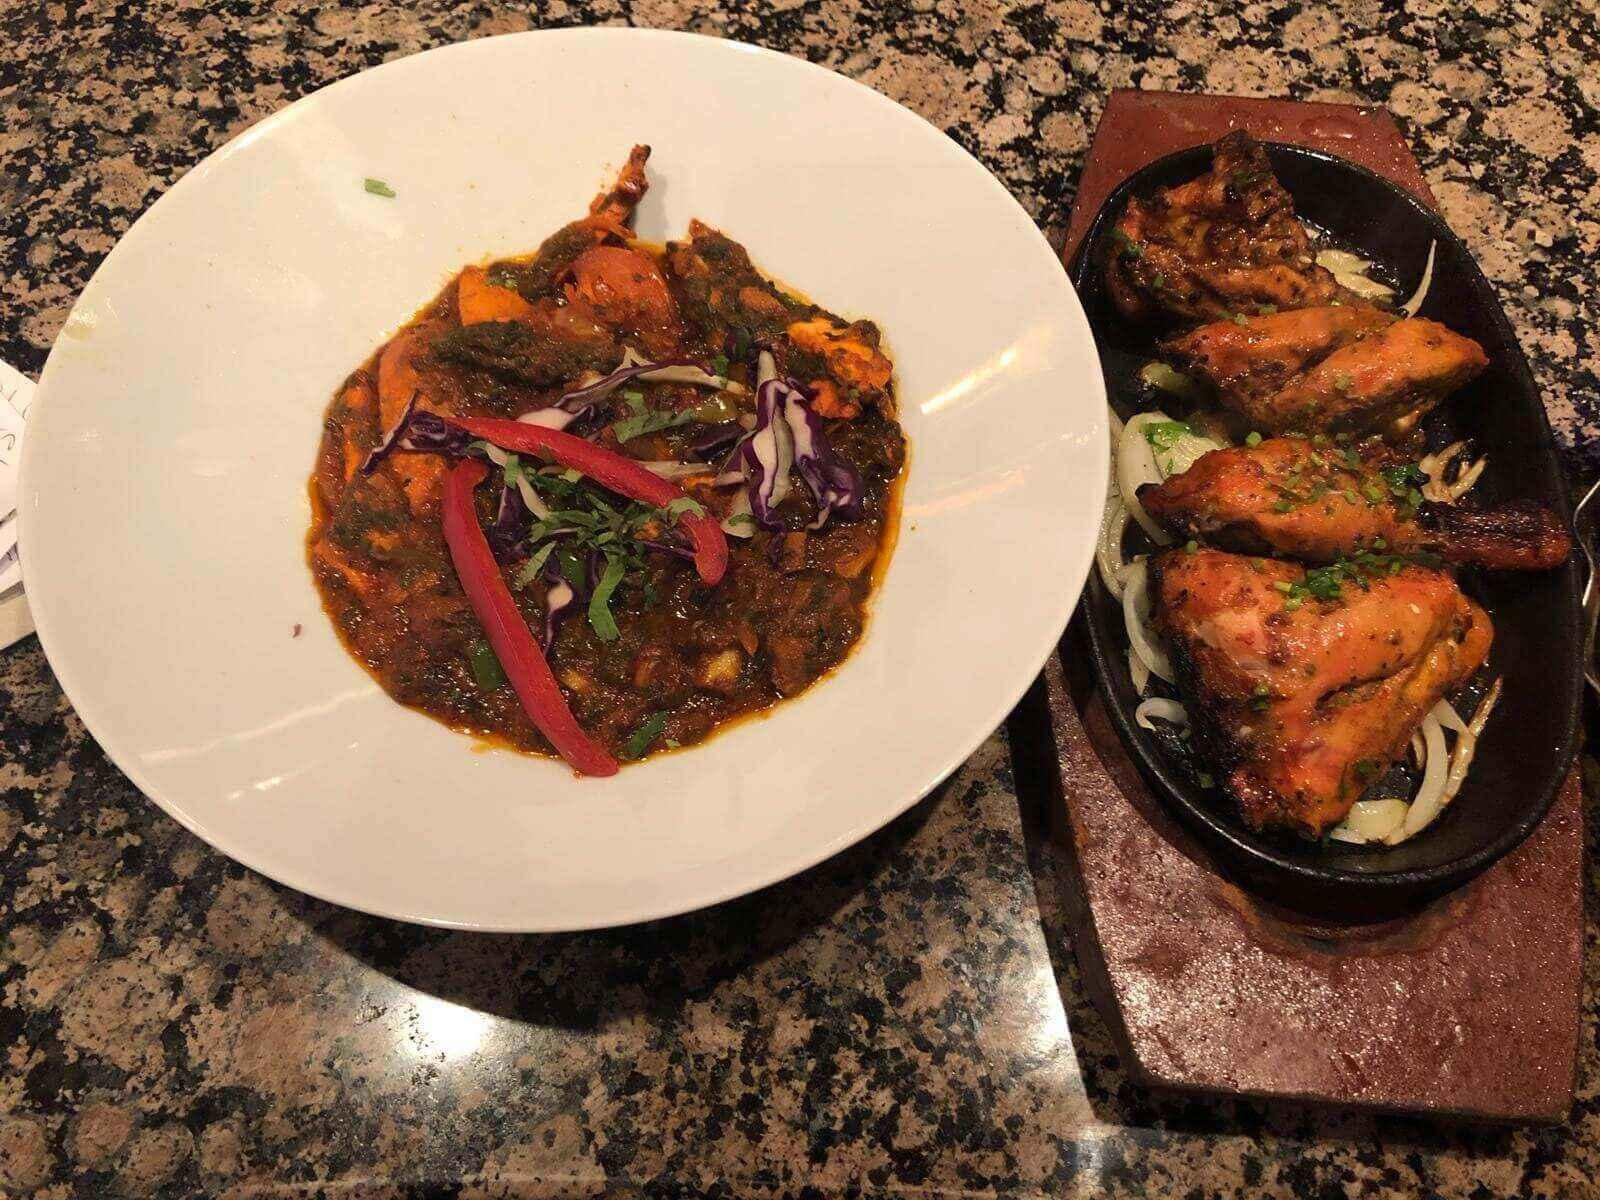 33. Indian food at khans restaurant battersea sw11